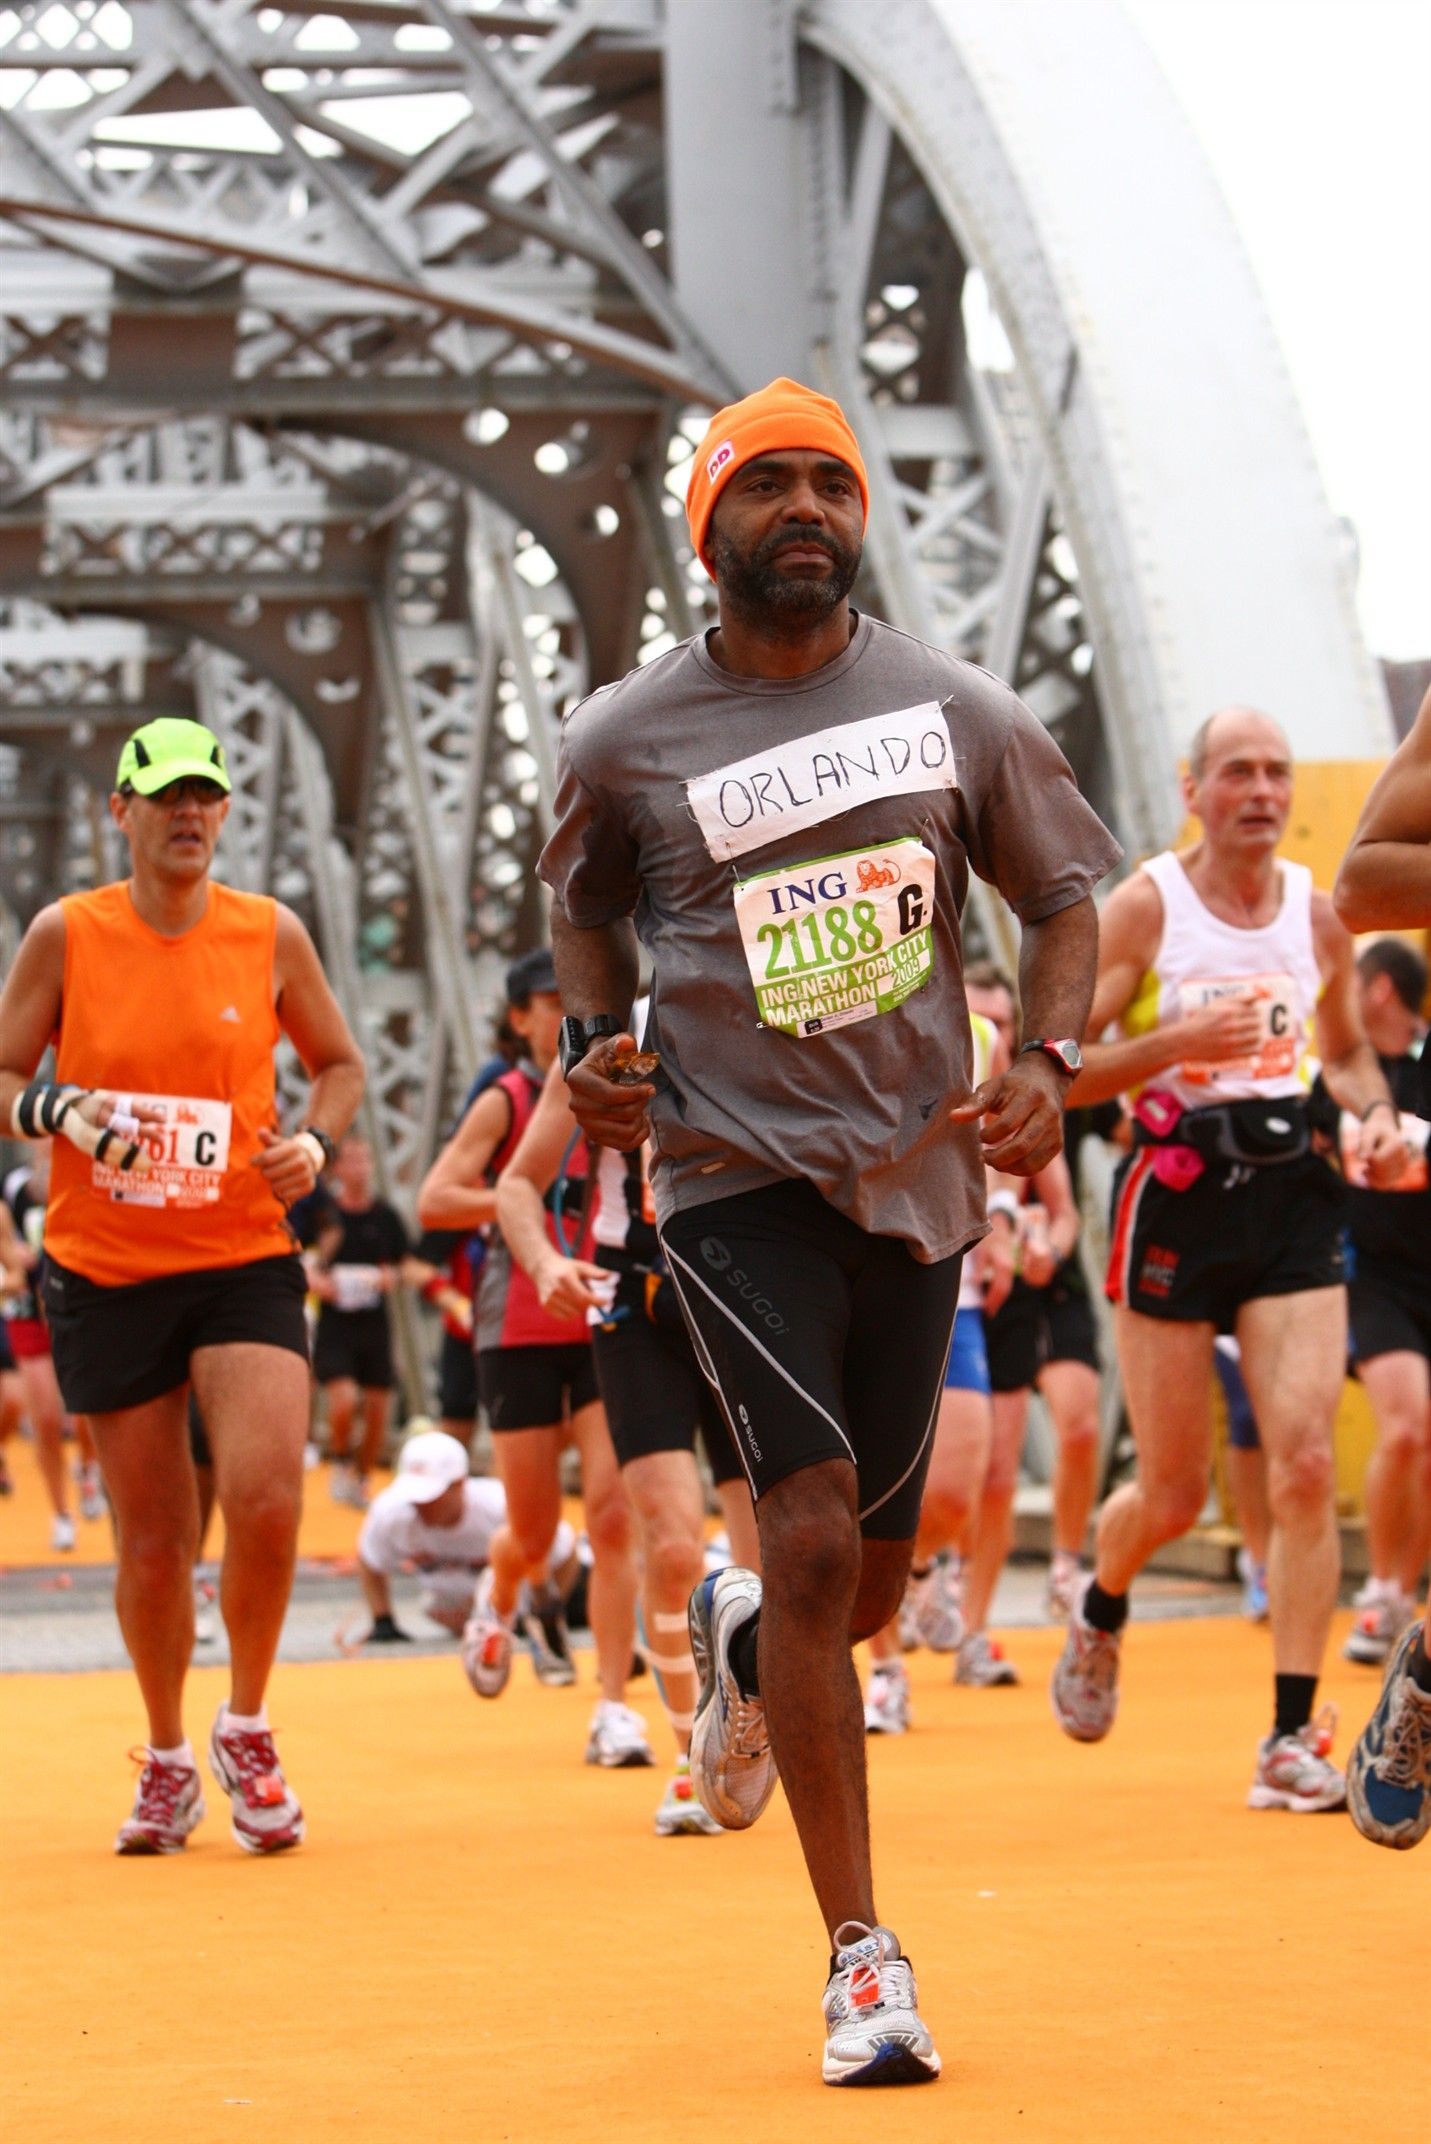 My New York City Marathon Run In 2009. Loved It!